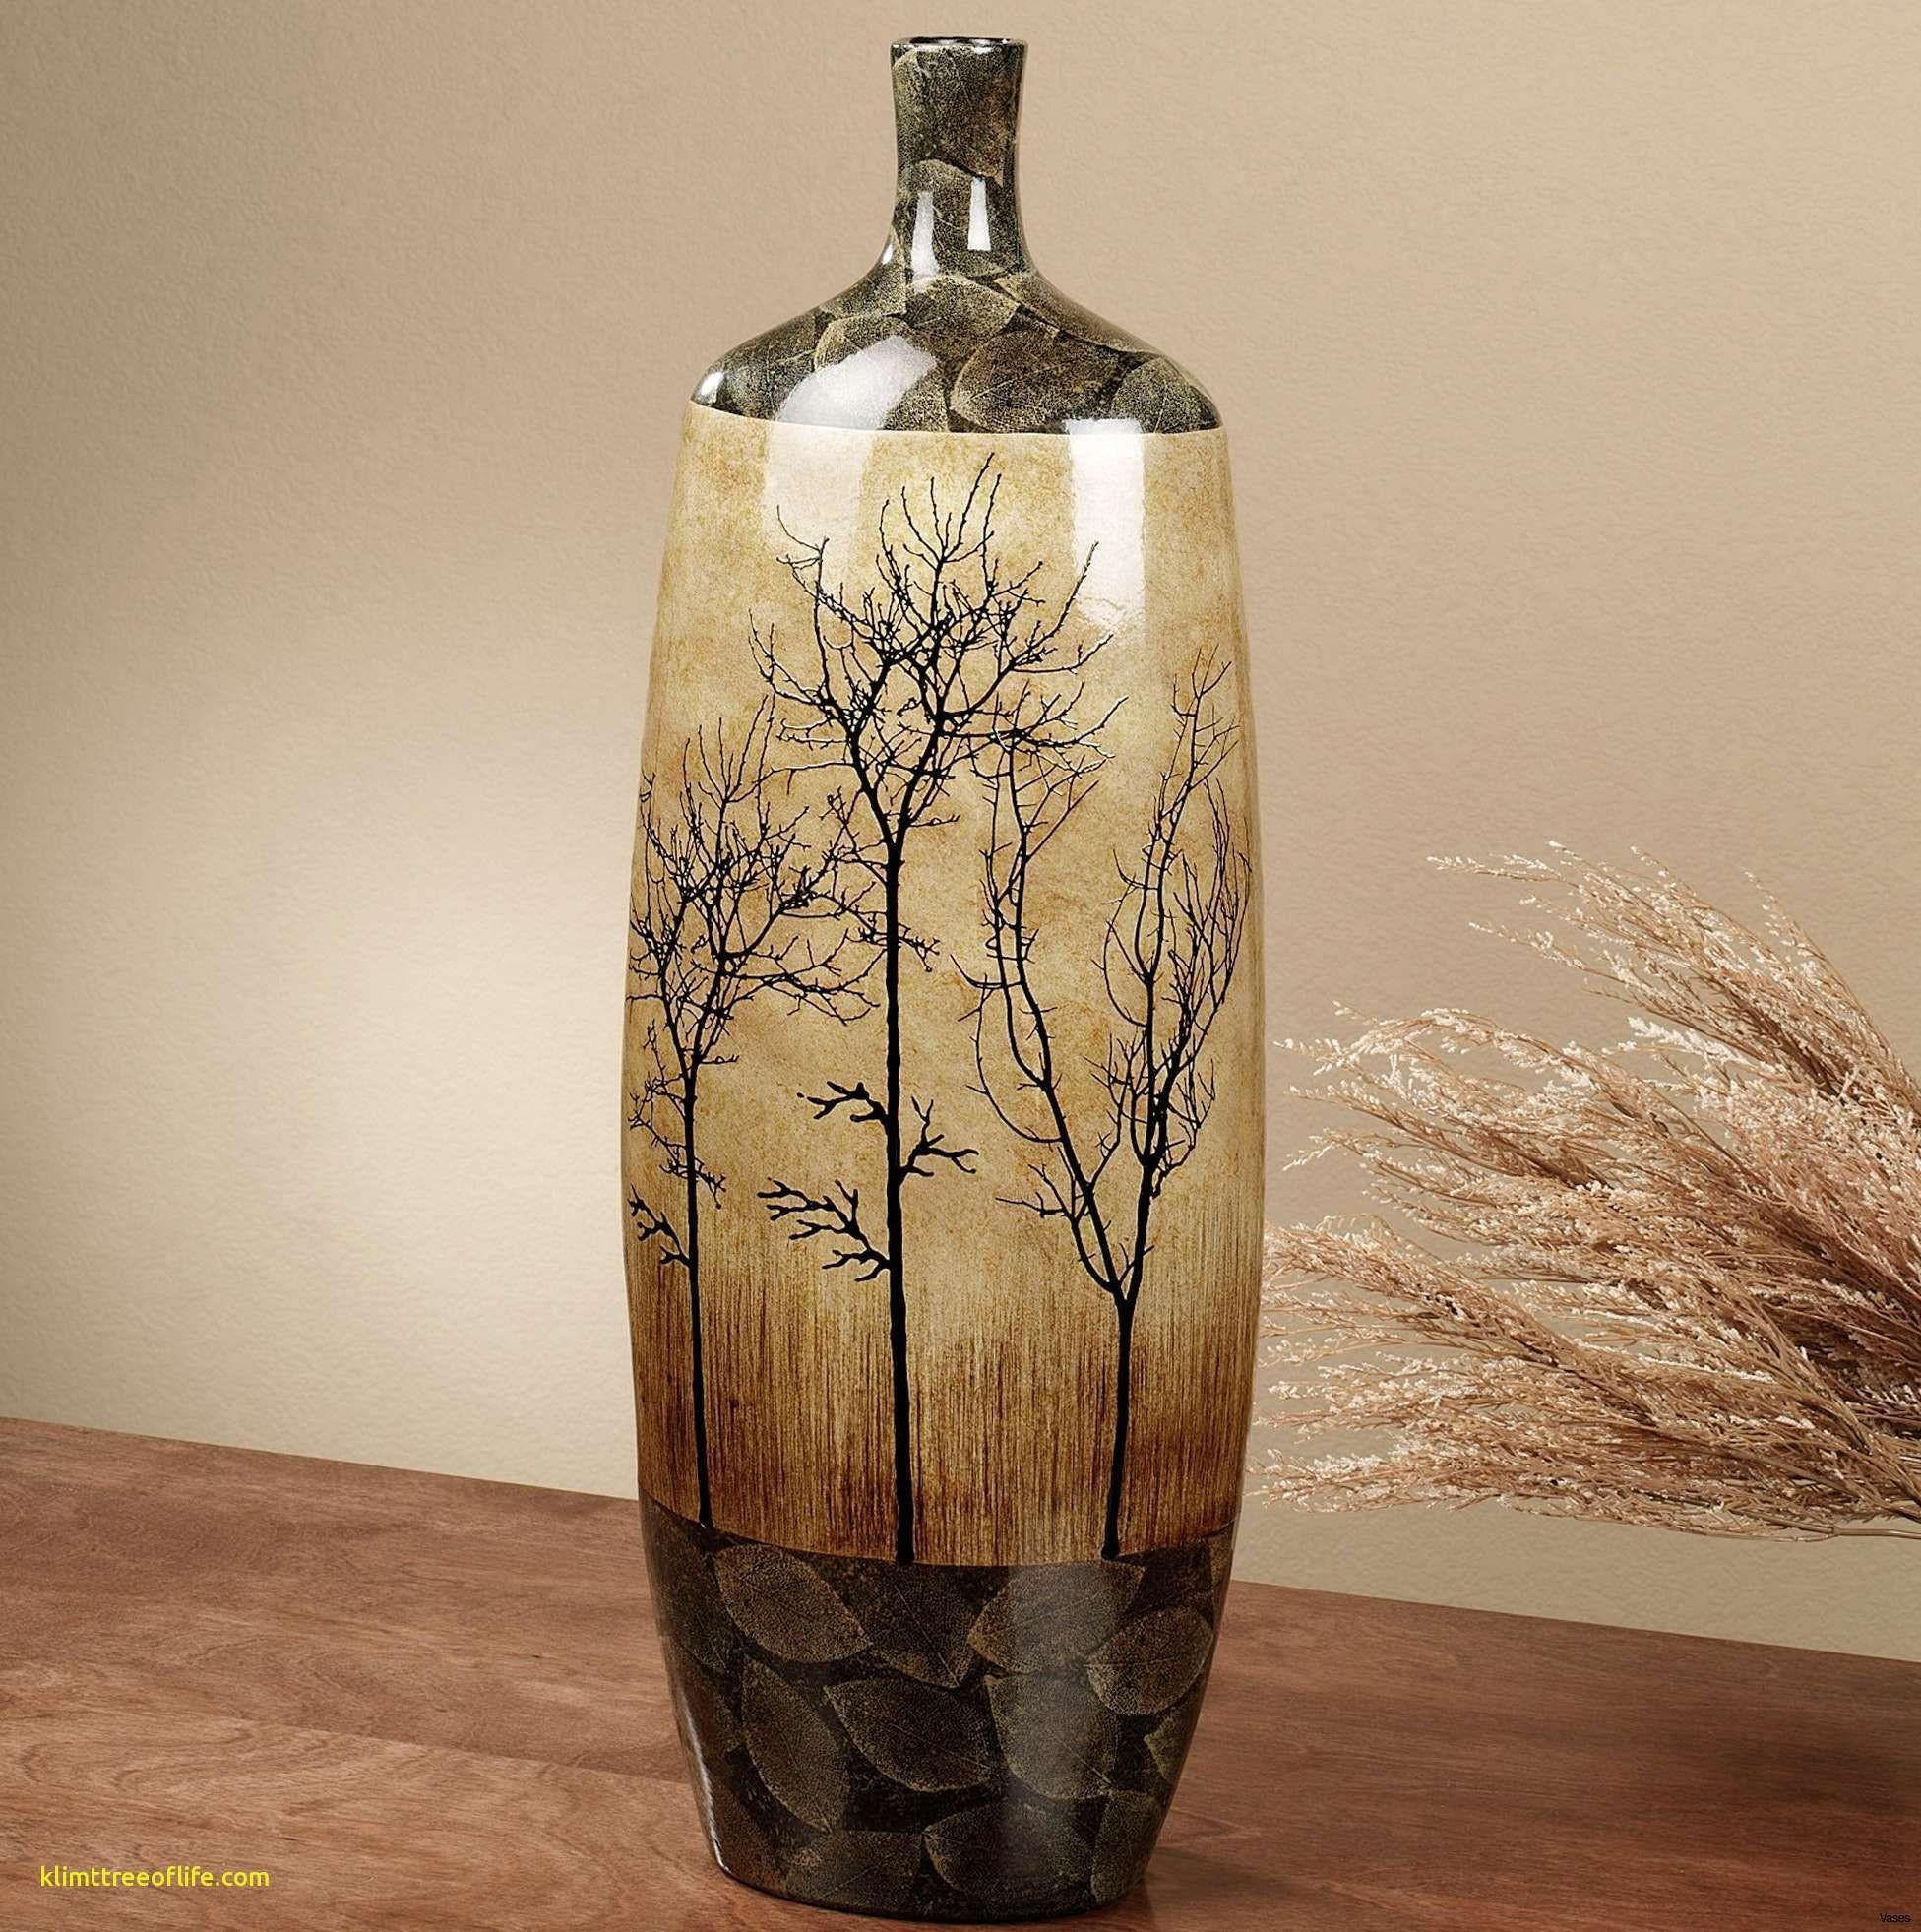 Large Indoor Floor Vases Of 30 Large Floor Vase the Weekly World Regarding 30 Large Floor Vase